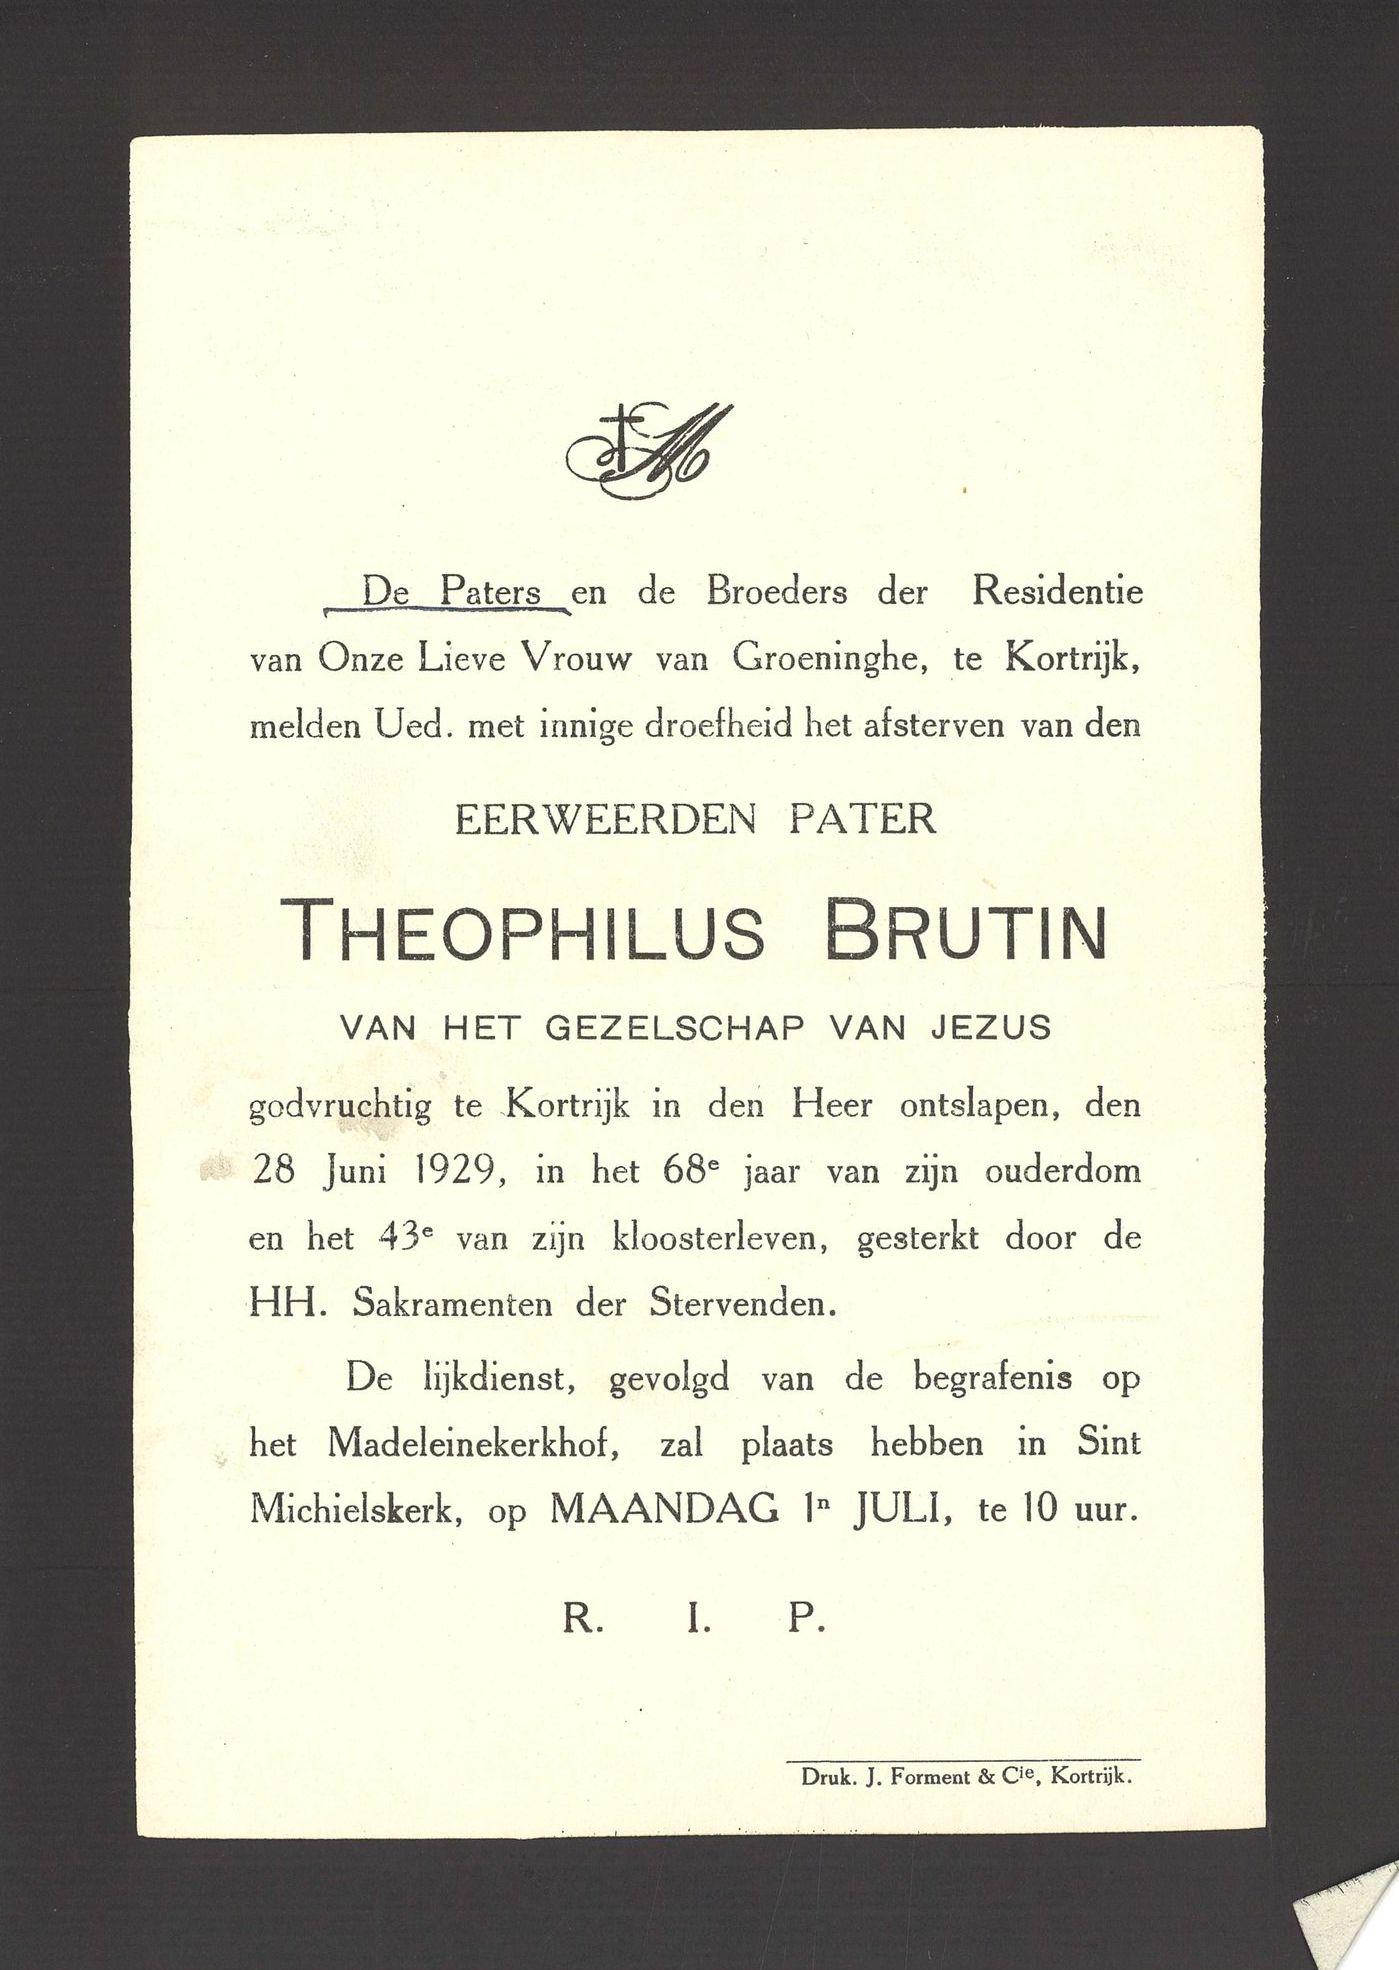 Theophilus Brutin